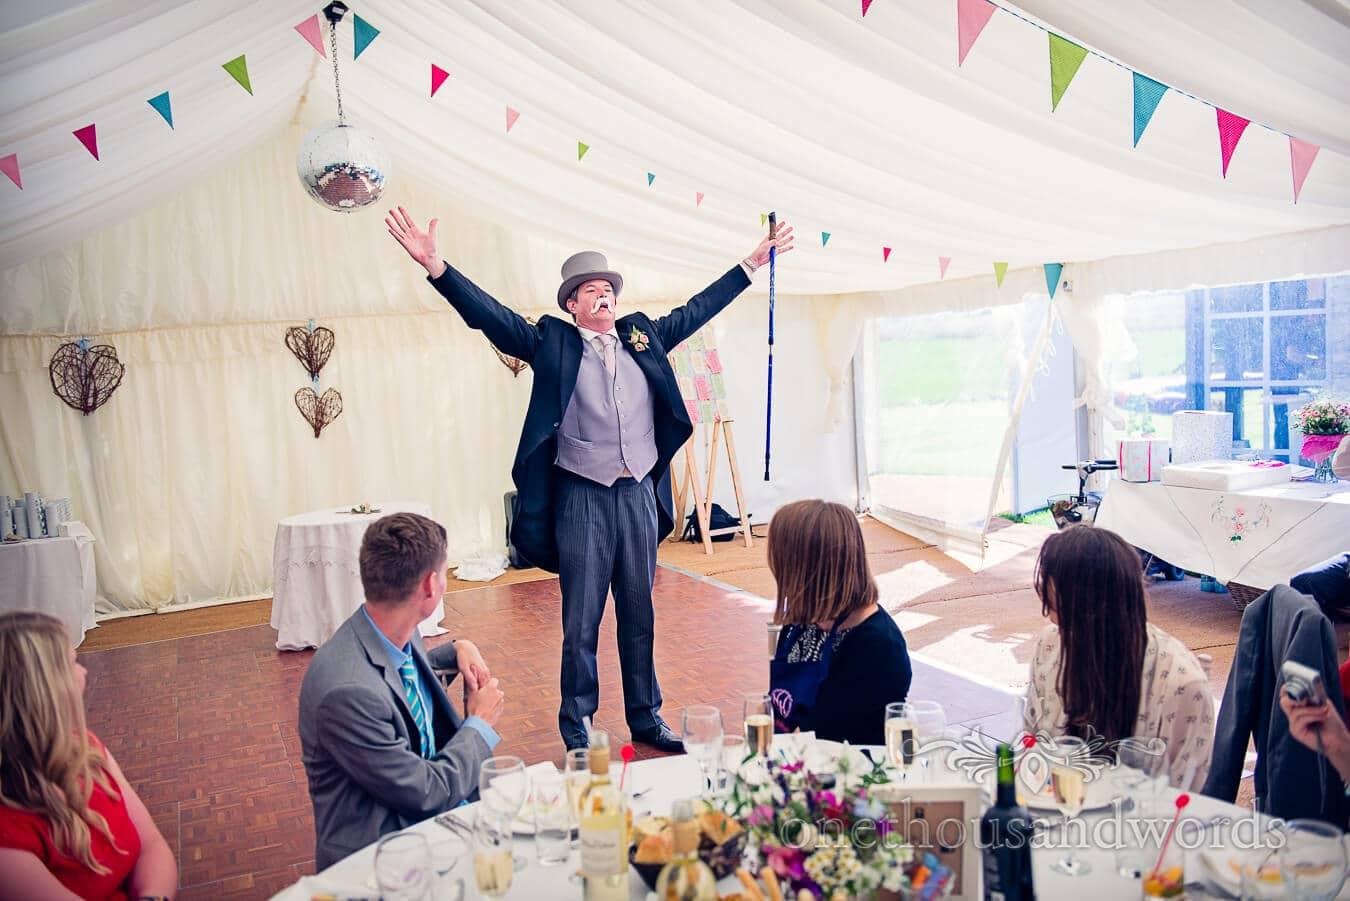 Best man's speech with props in wedding marquee